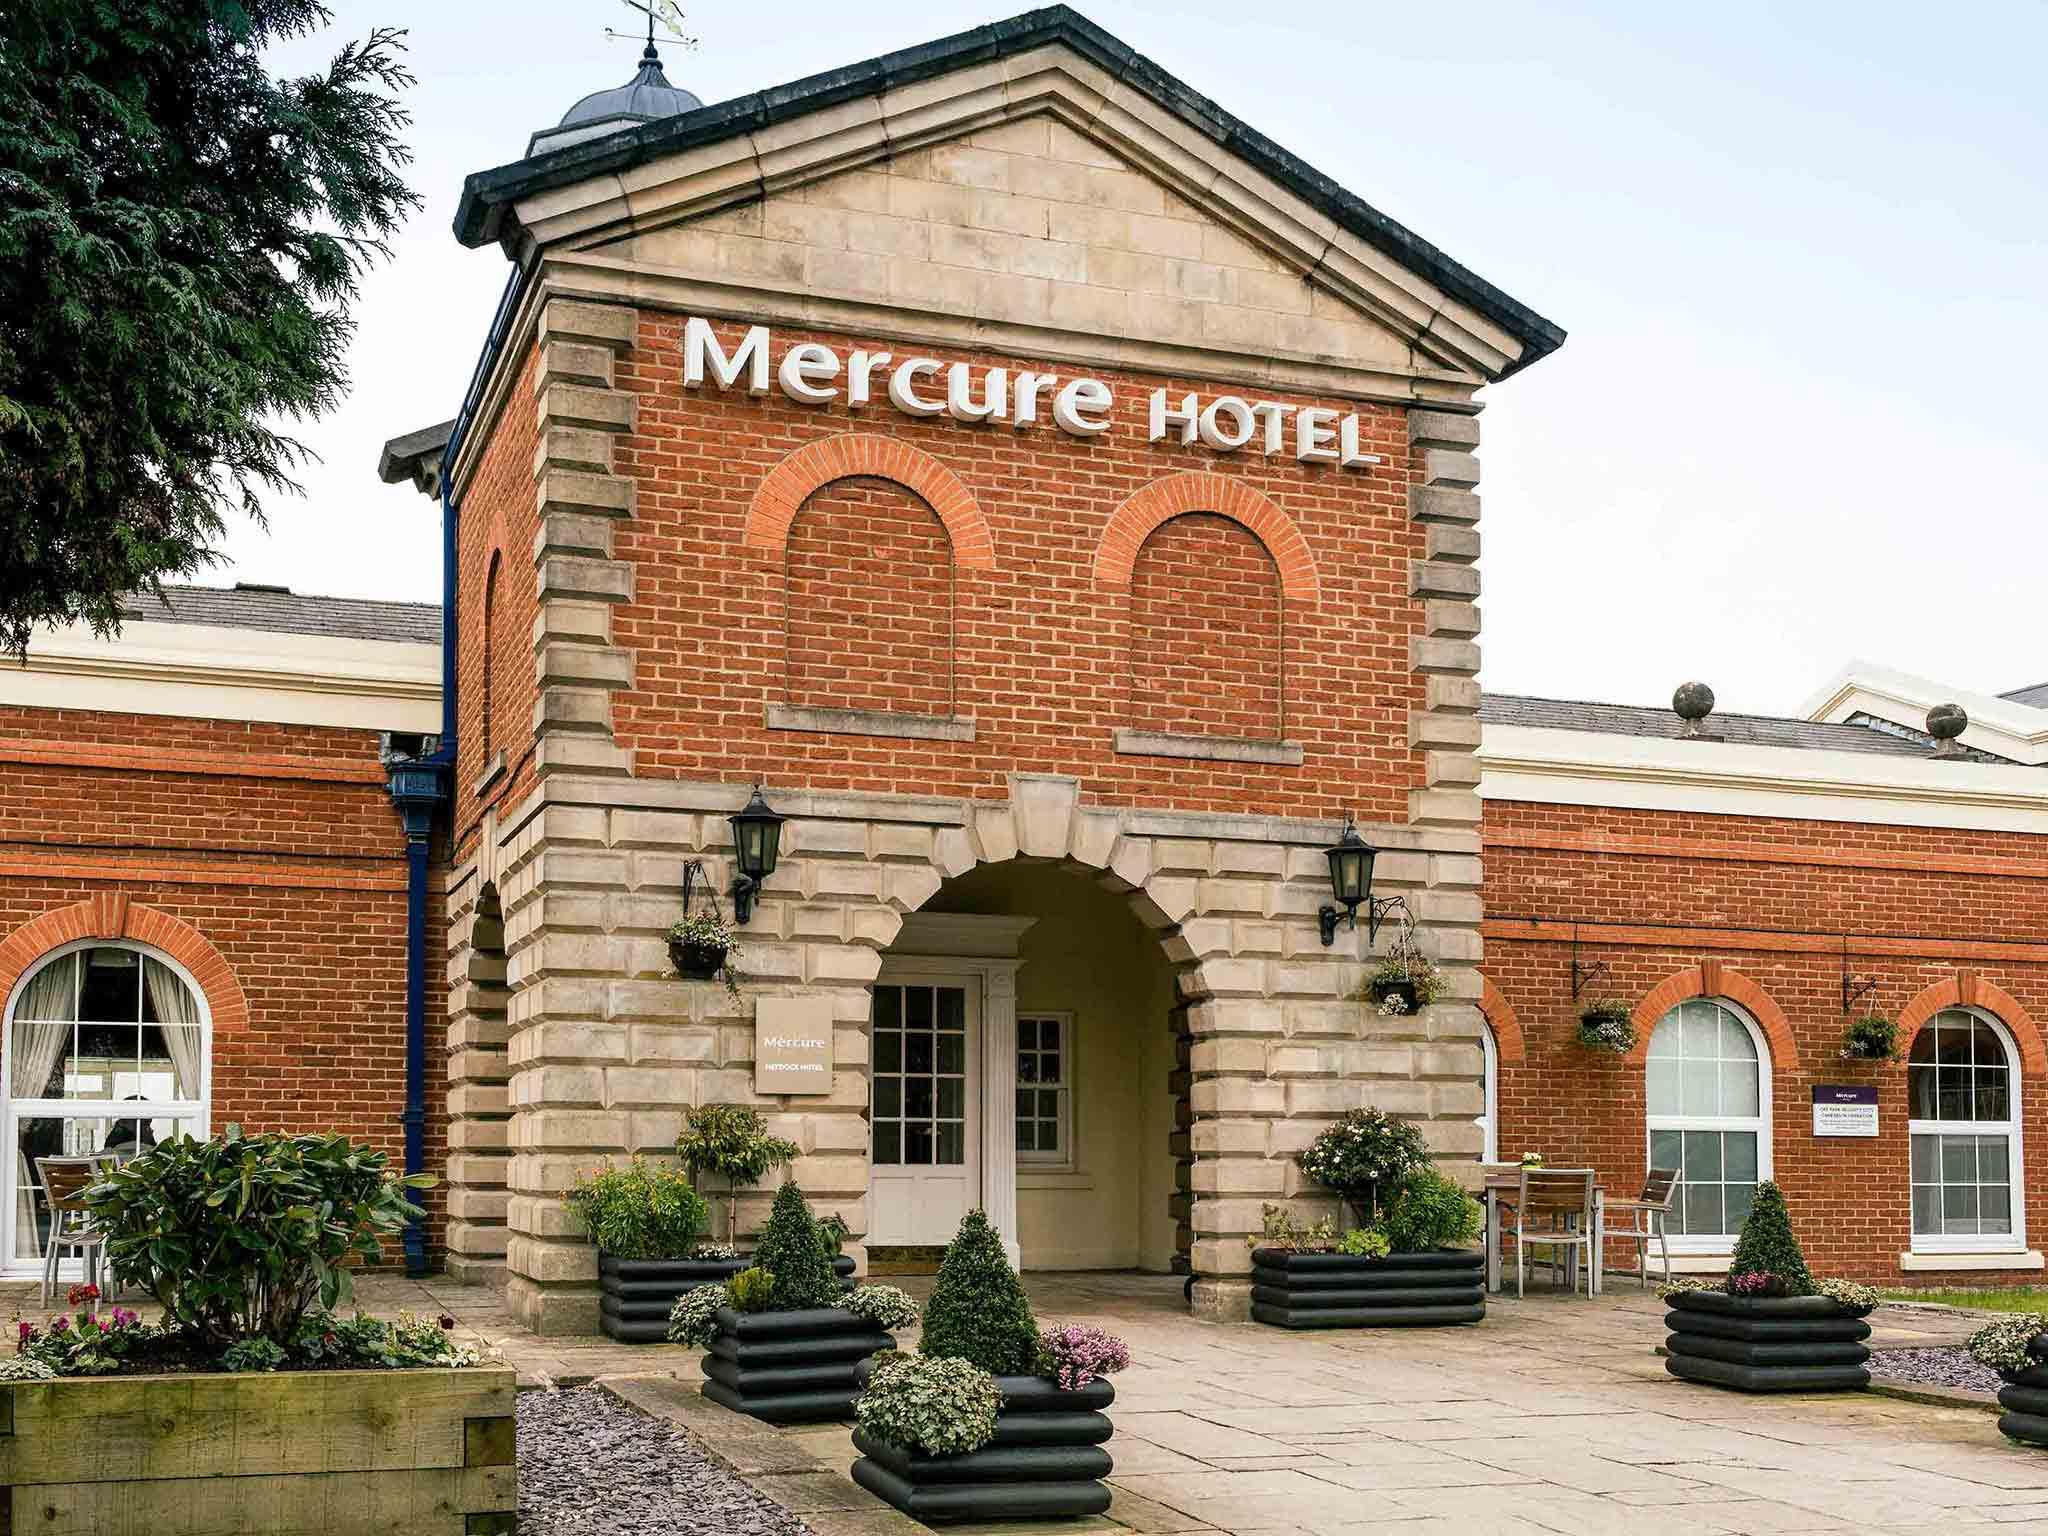 Otel – Mercure Haydock Hotel (Newly Refurbished)